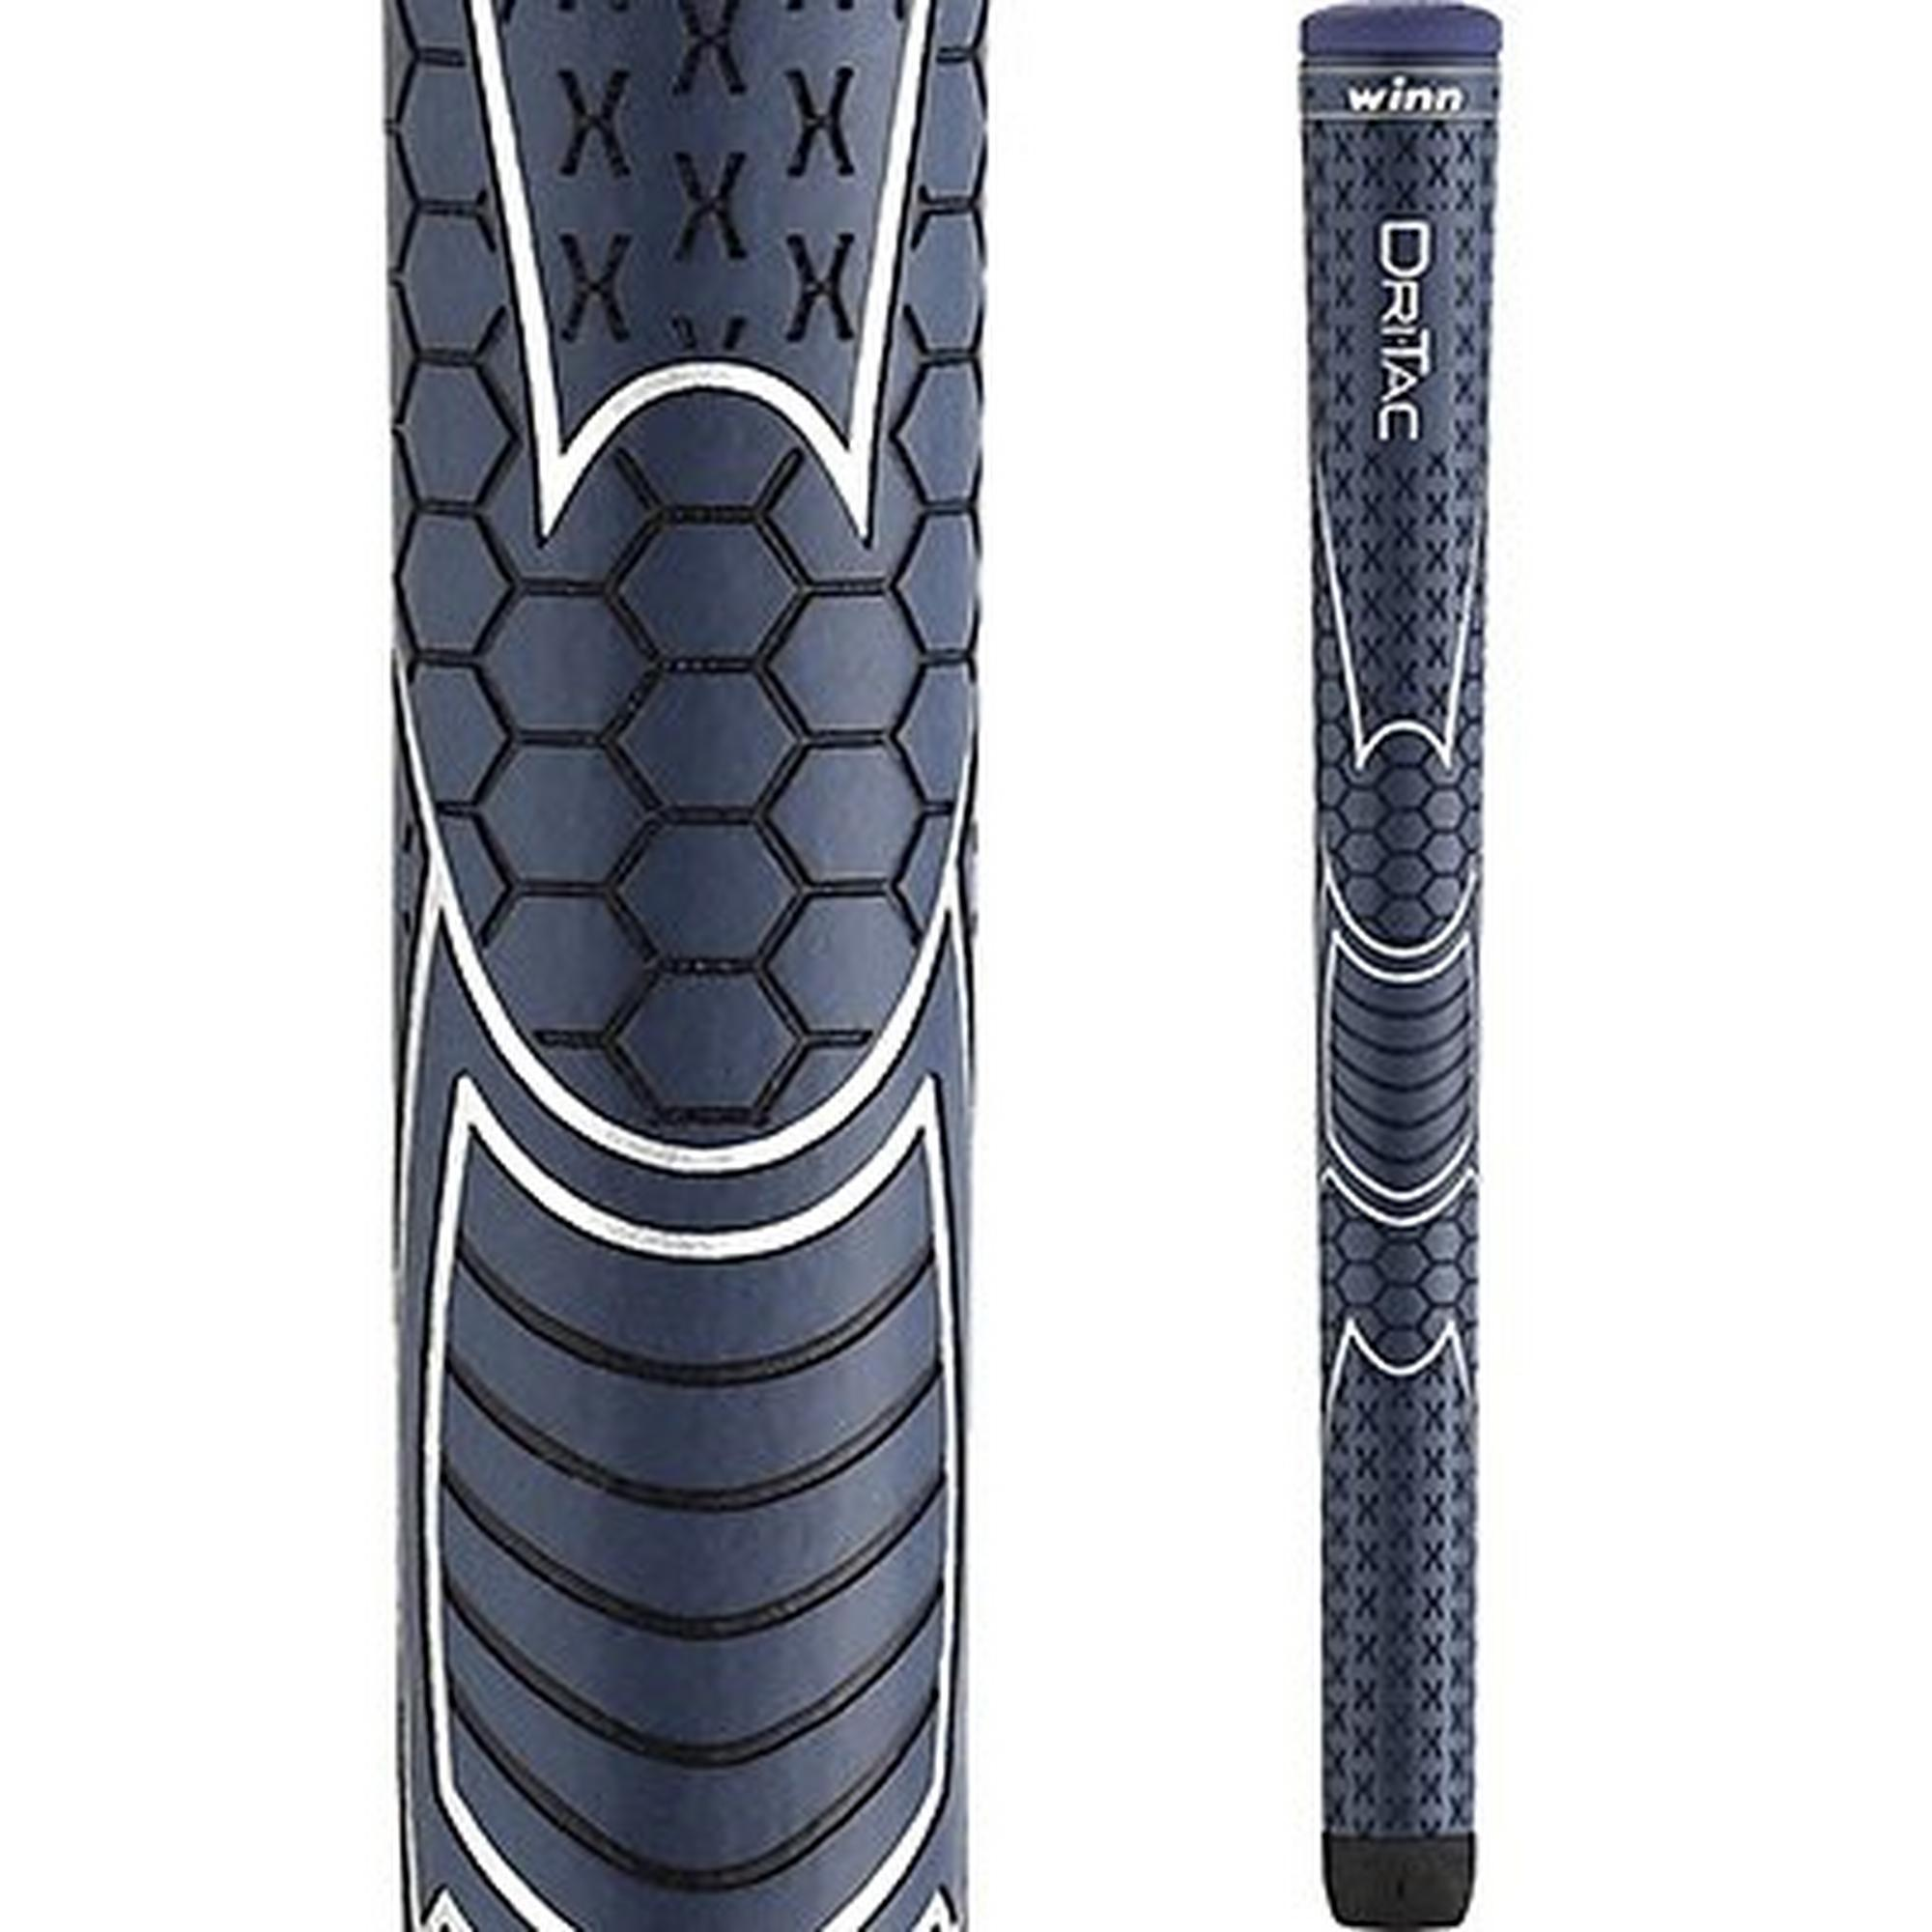 Dri-Tac Midsize Grip - Navy Blue (+1/16 Inch)